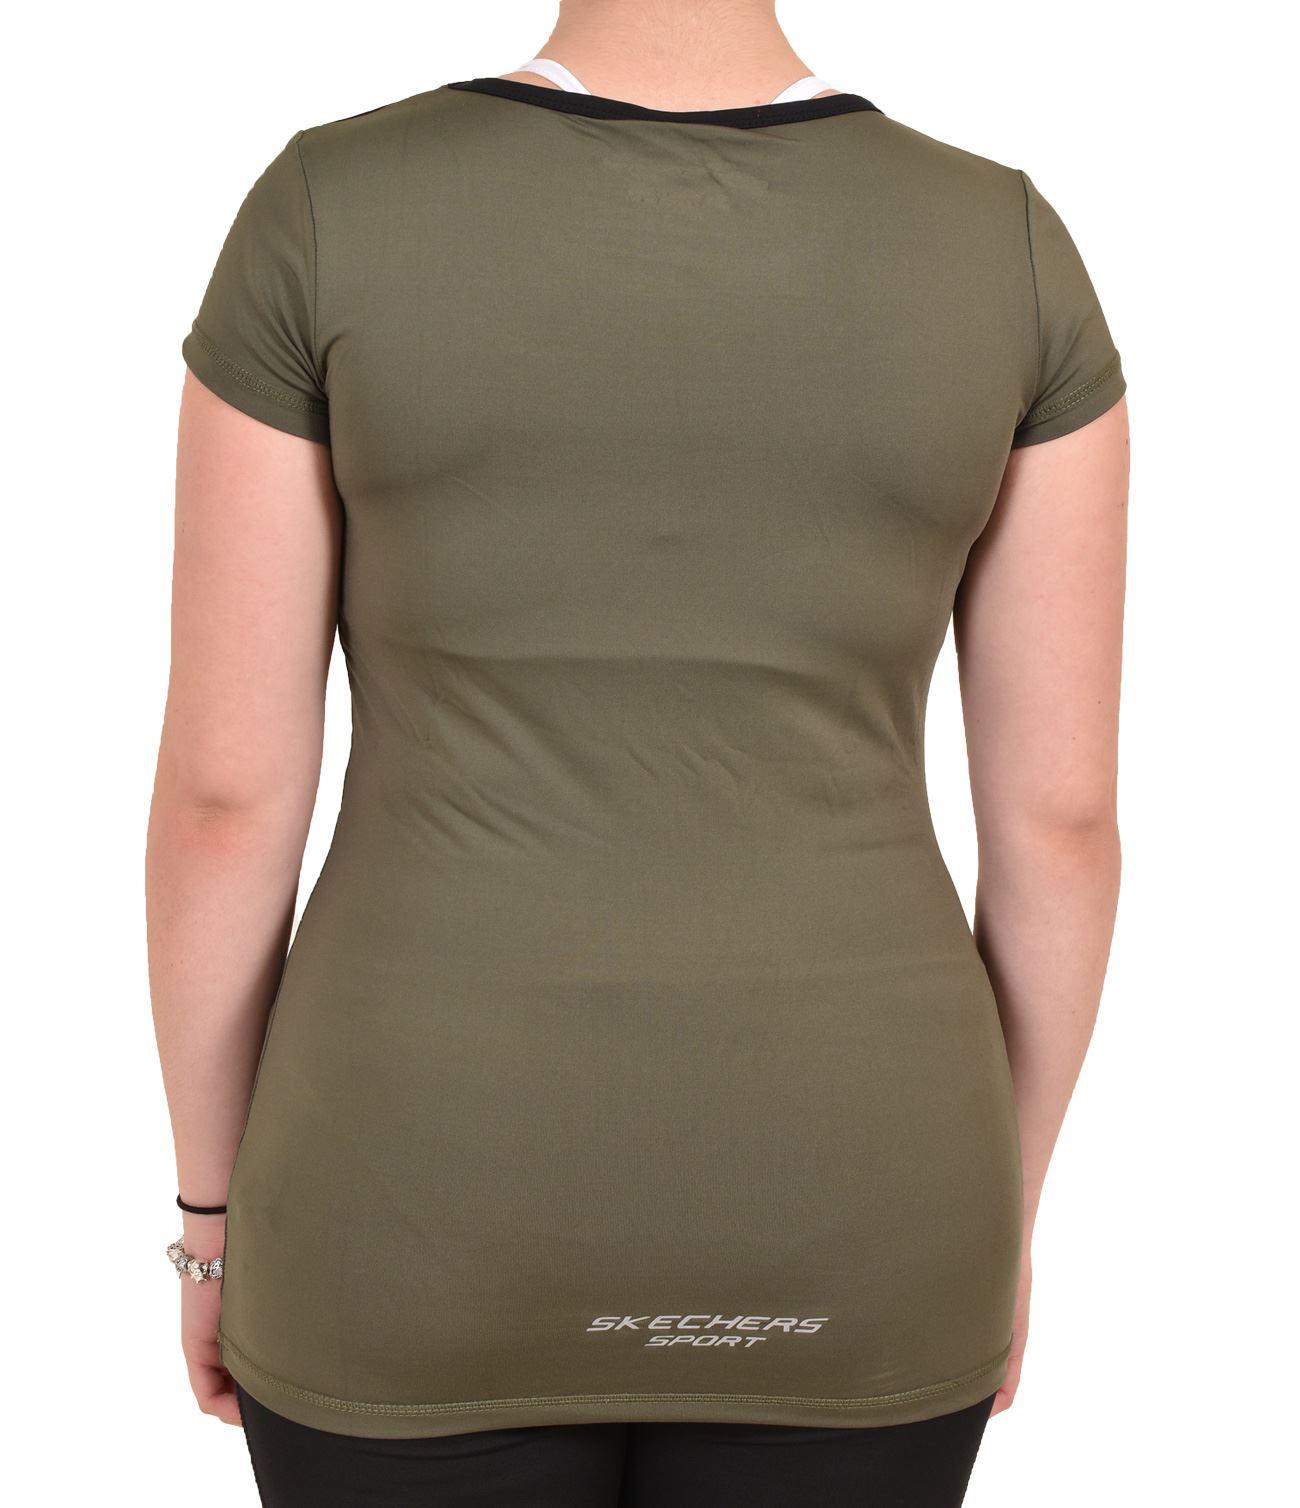 Camiseta-para-mujer-Skechers-Secado-Rapido-Top-senoras-de-Deportes-Activewear-Gimnasio-Fitness-Dance miniatura 9